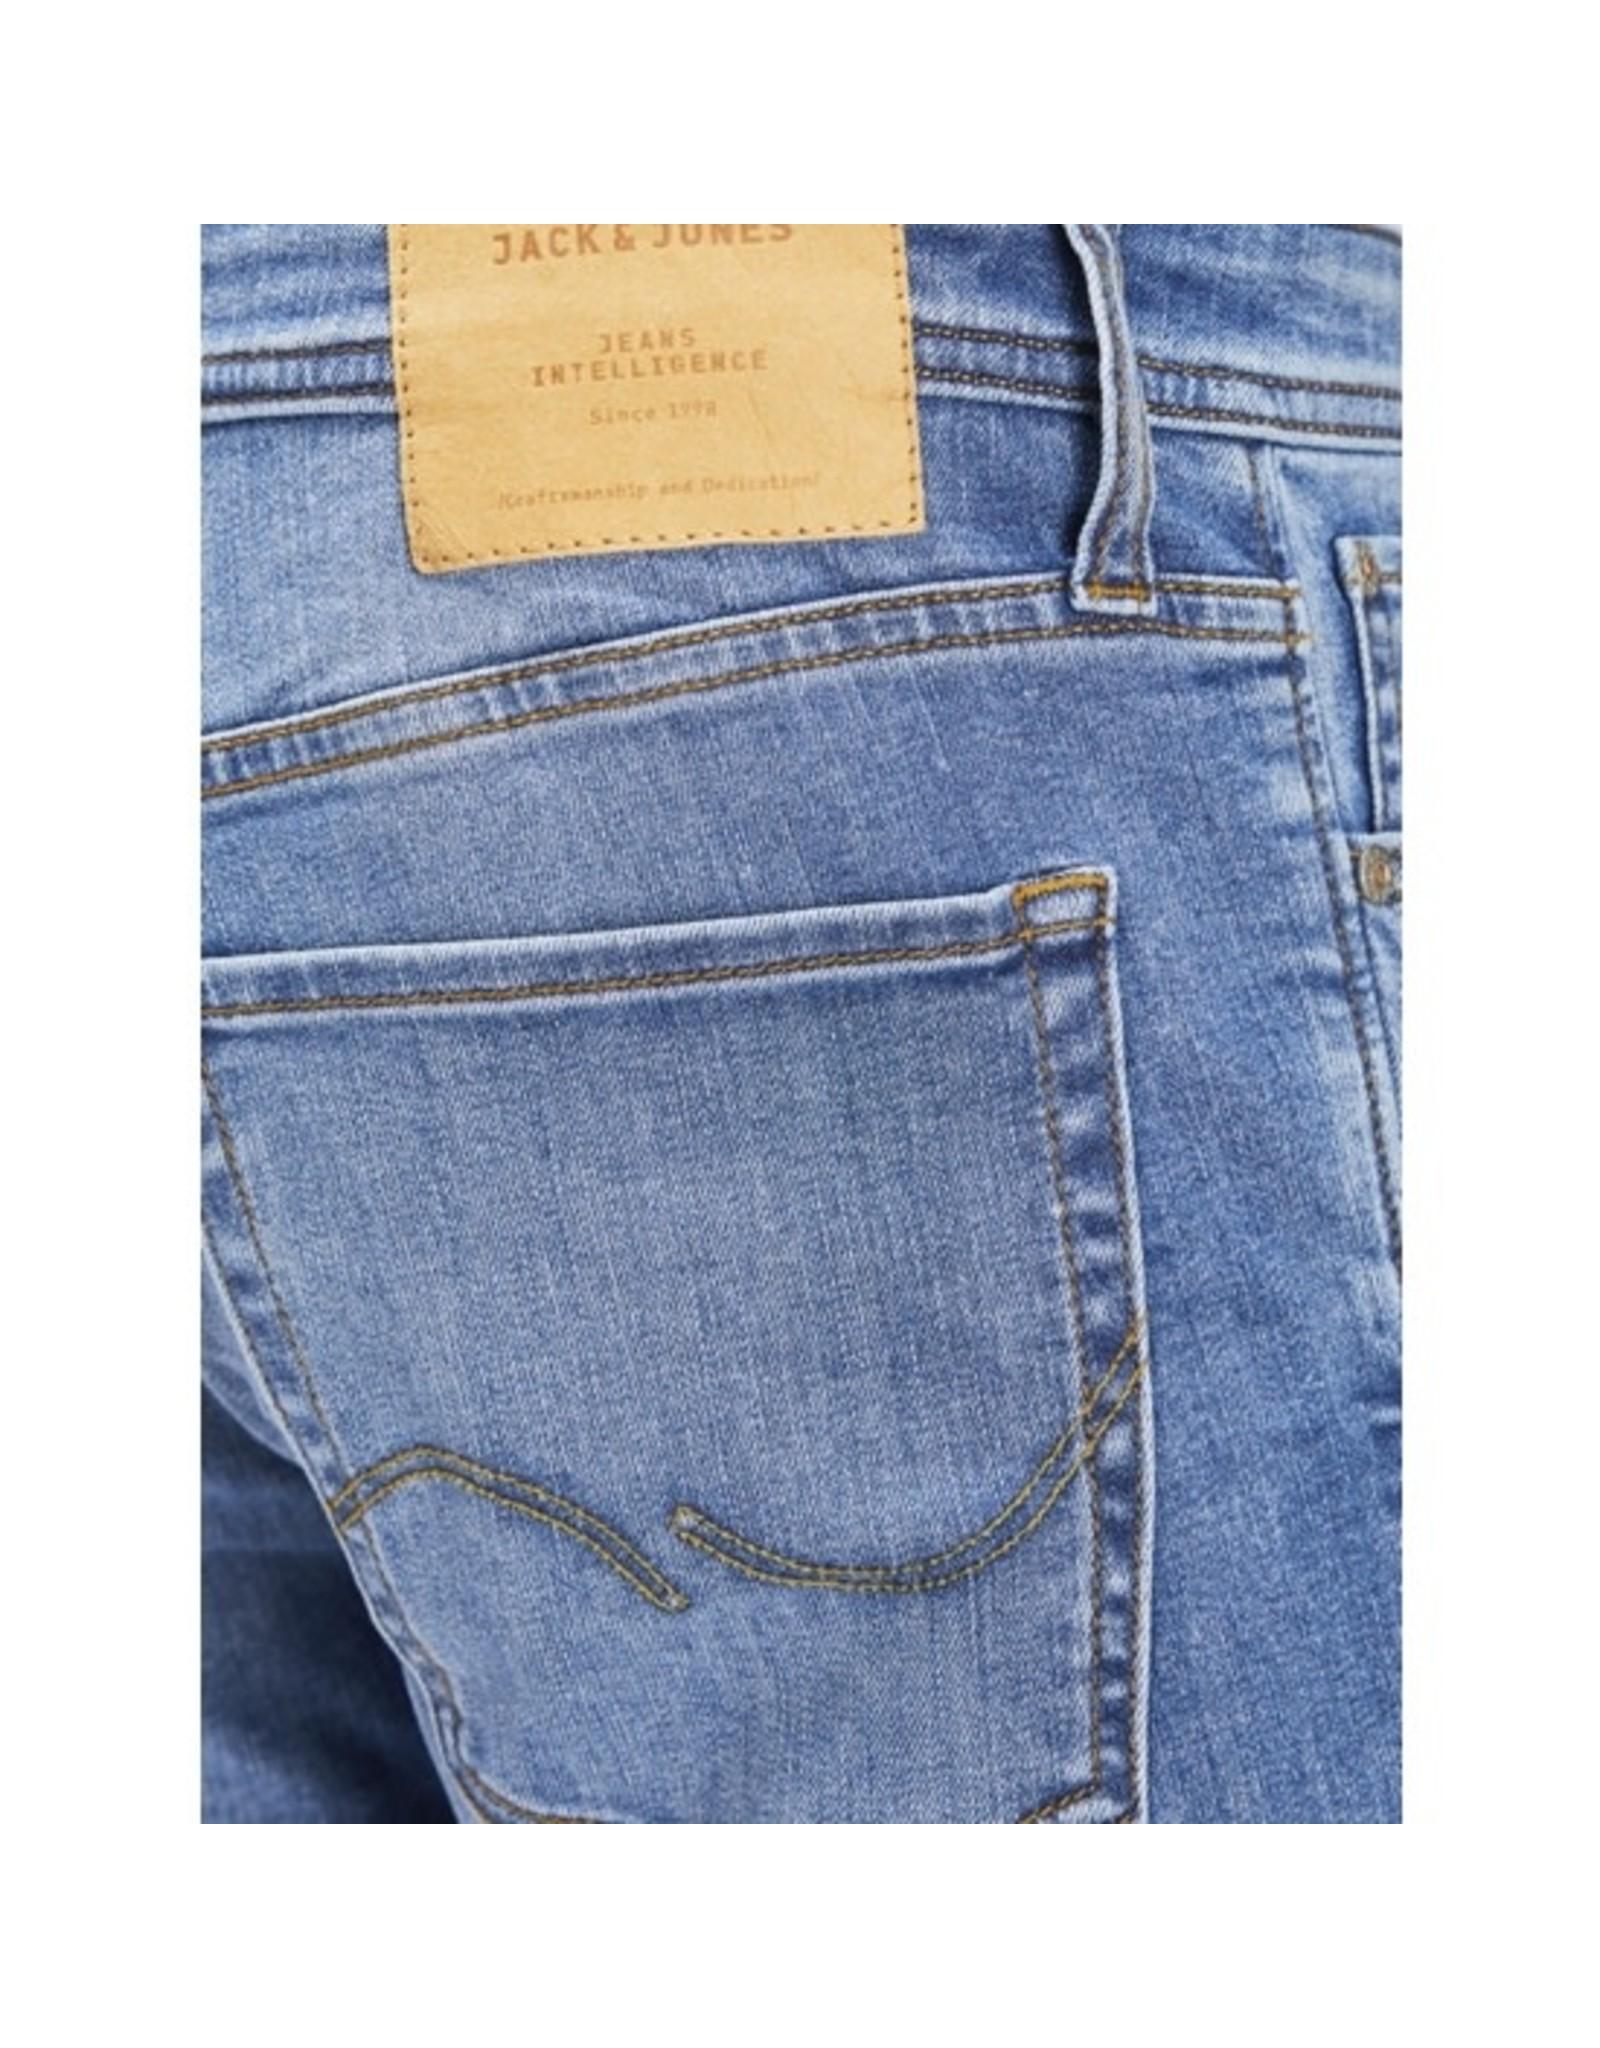 Jack & Jones The Glenn Slim Fit Denim Jeans